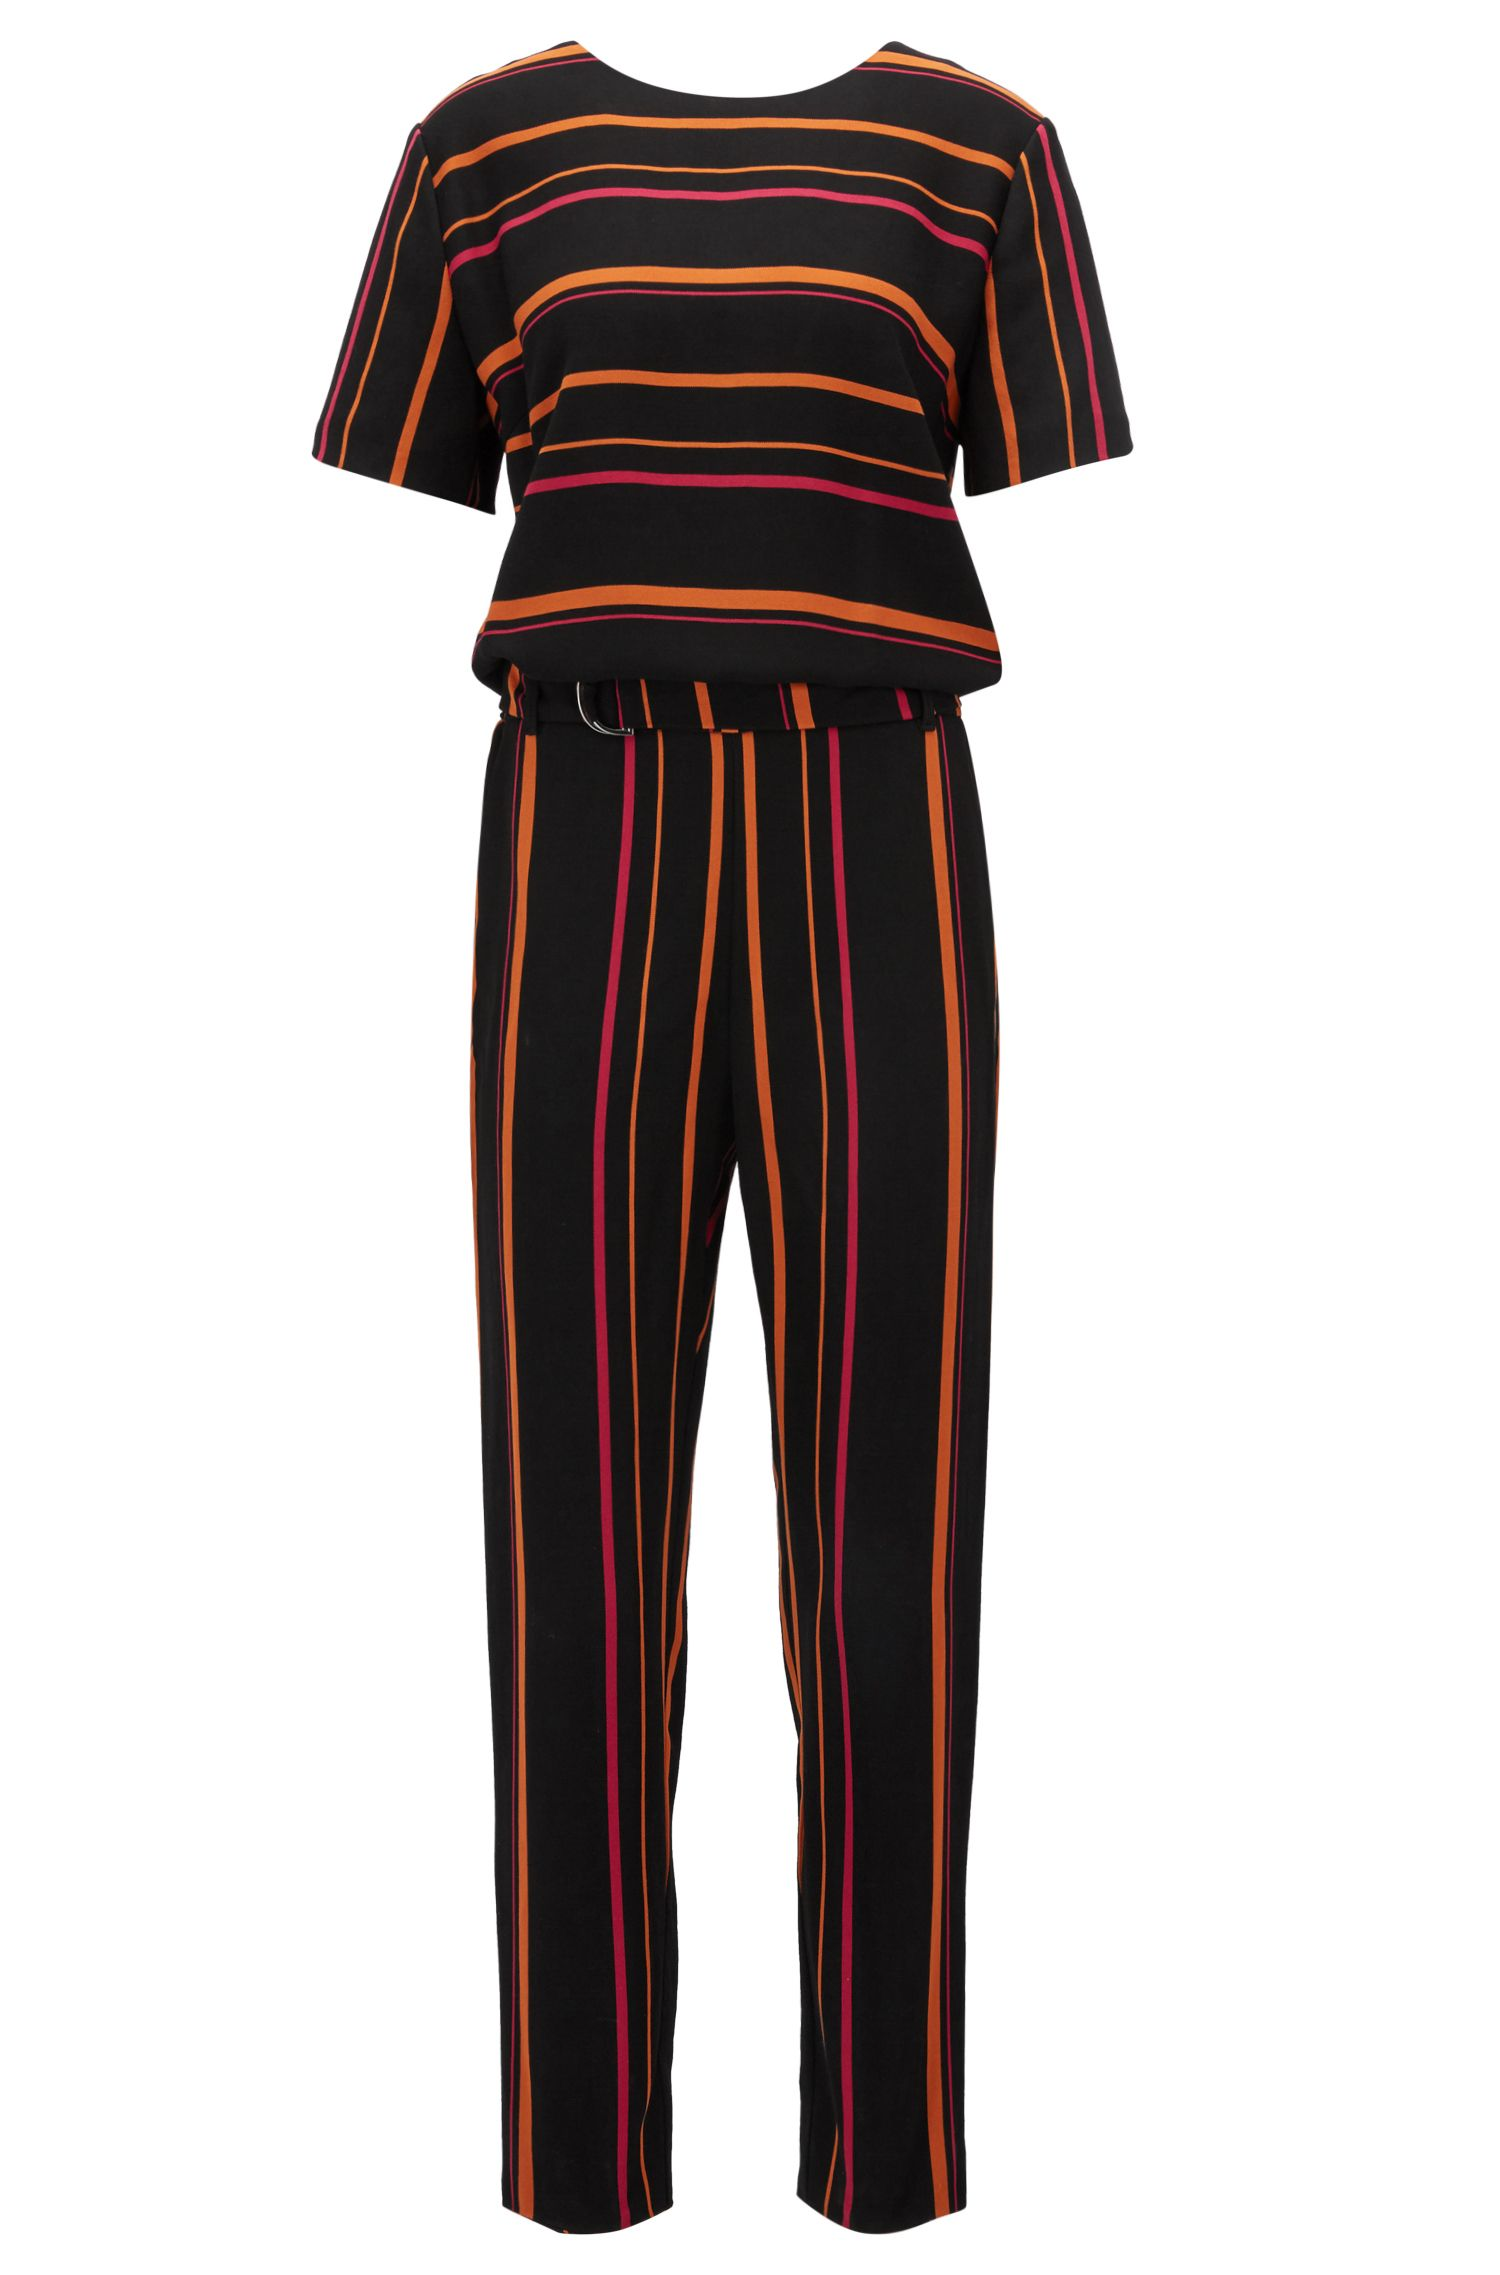 Multi-coloured striped jumpsuit in draped twill